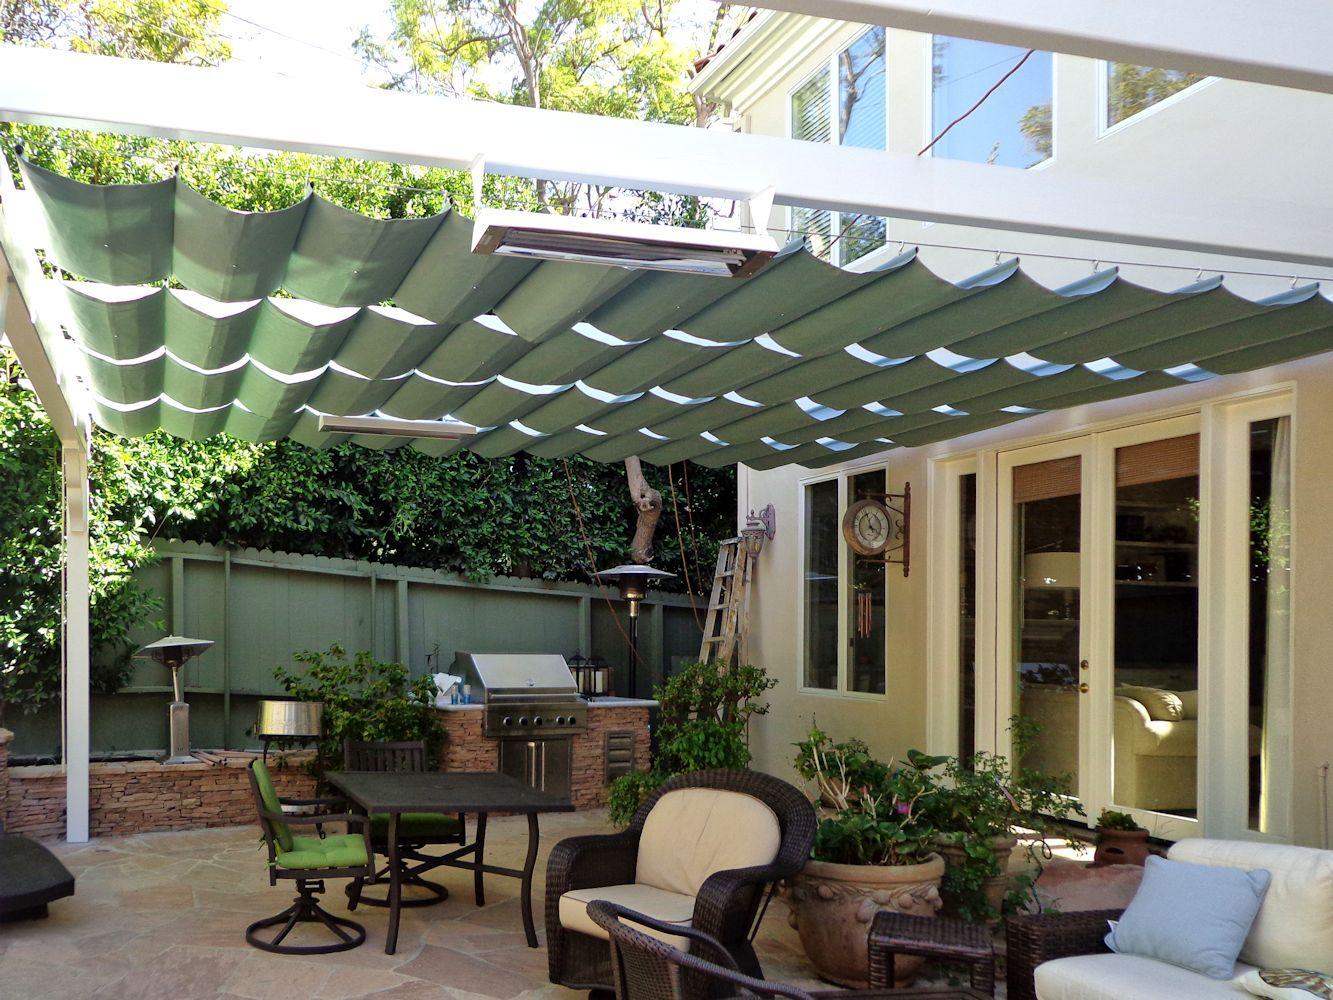 Slide Wire Canopy Outdoor Living & Garden Ideas